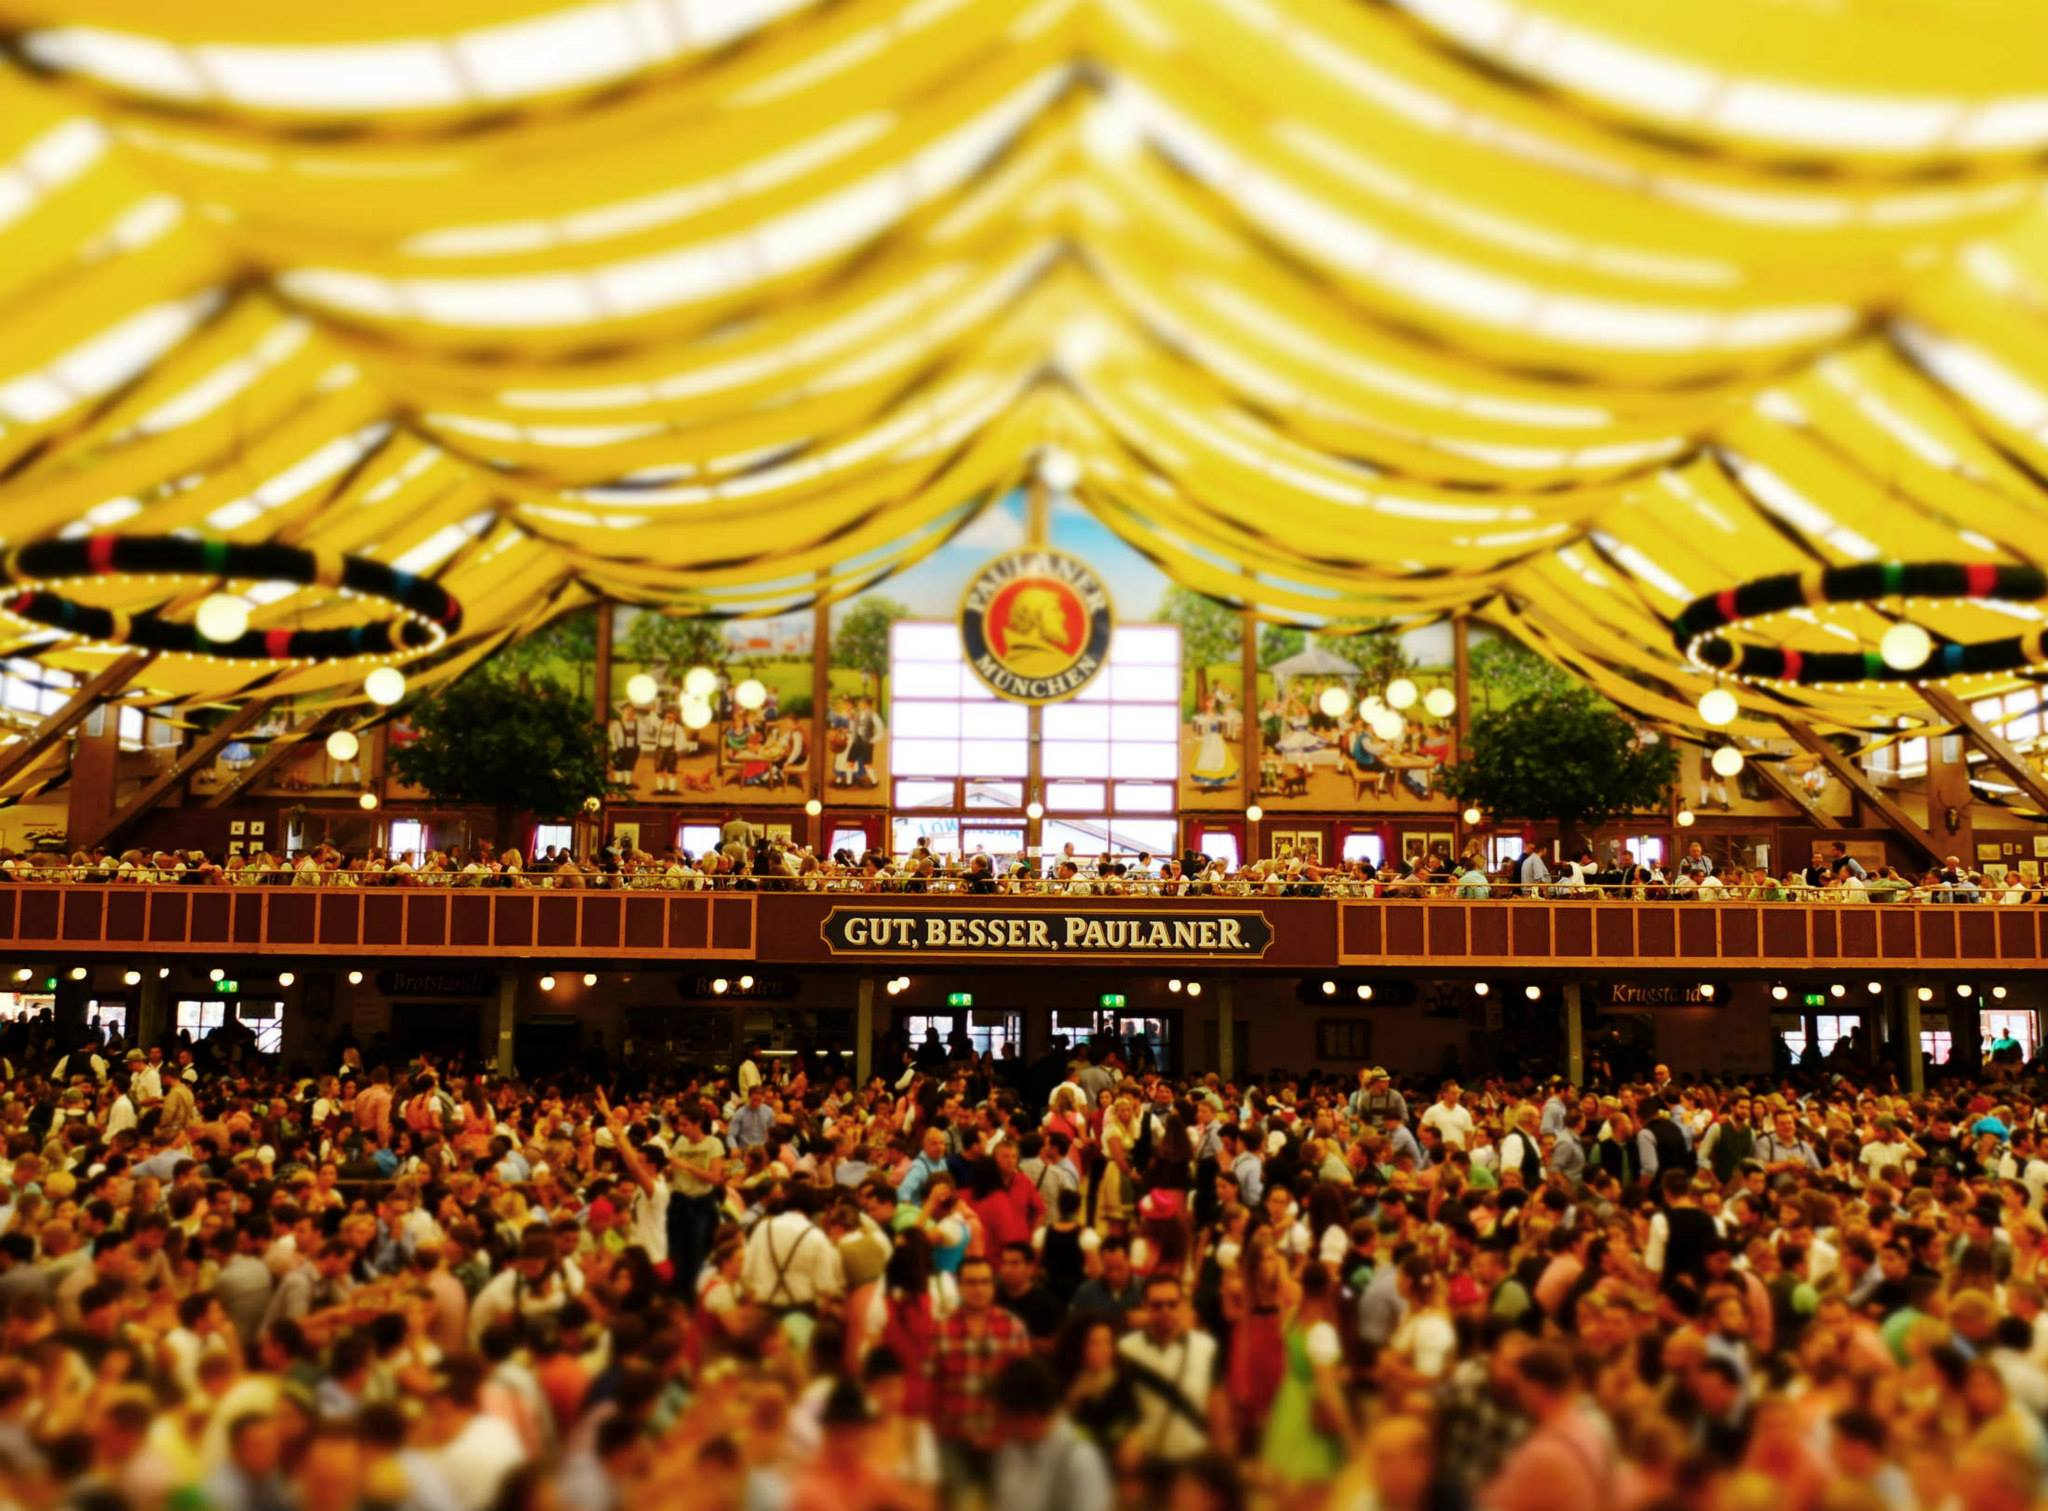 La Guida - Un grande luna park per l'Oktoberfest Cuneo